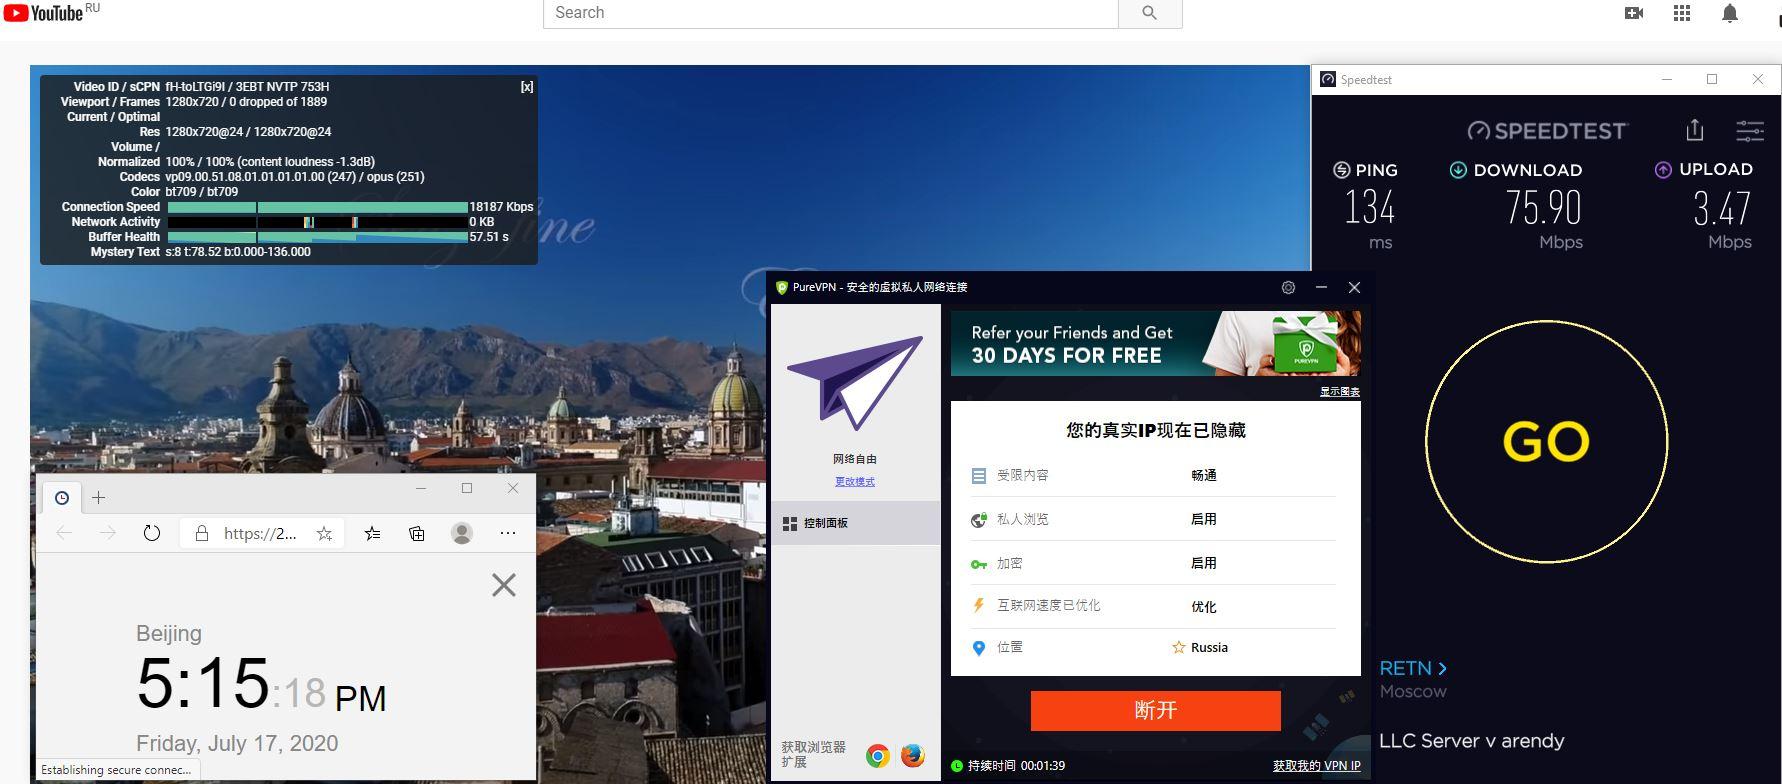 Windows10 PureVPN Russia 中国VPN 翻墙 科学上网 测速-20200717